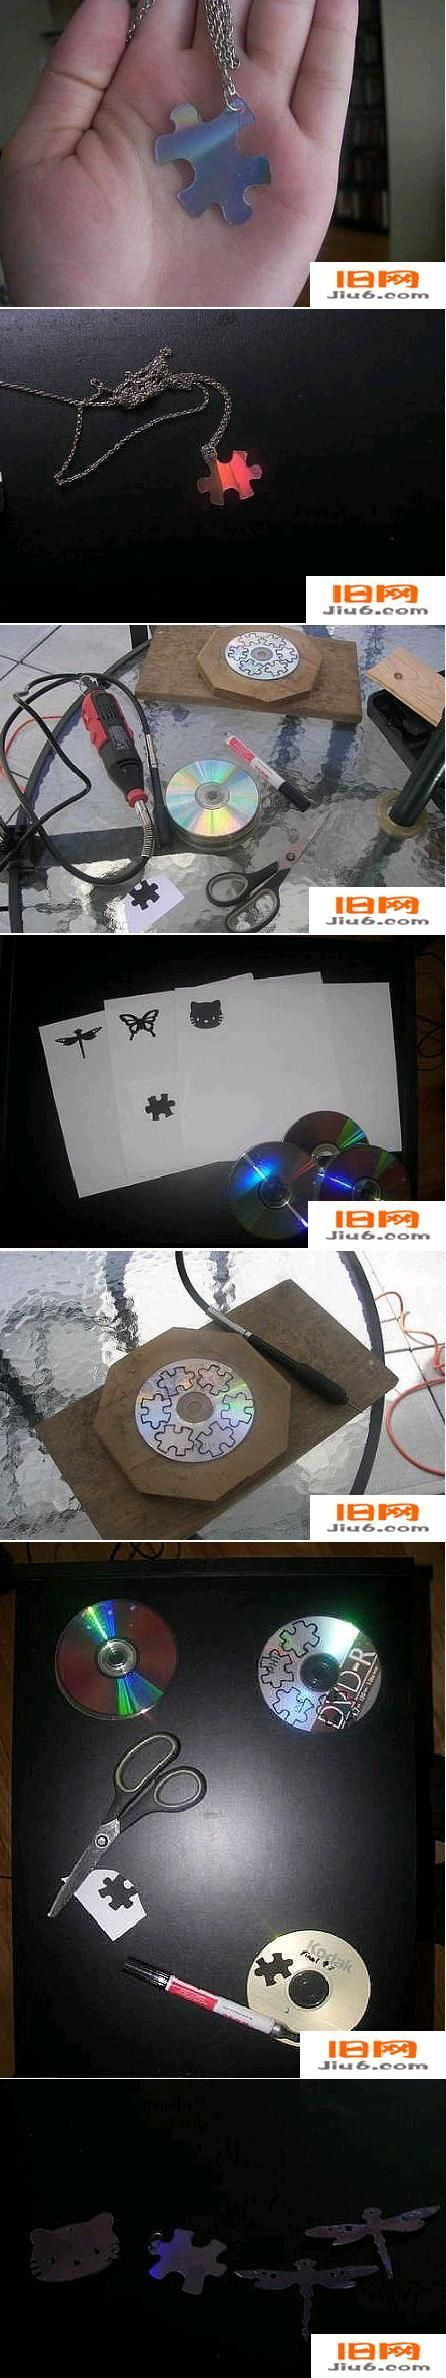 DIY Old CD Necklace